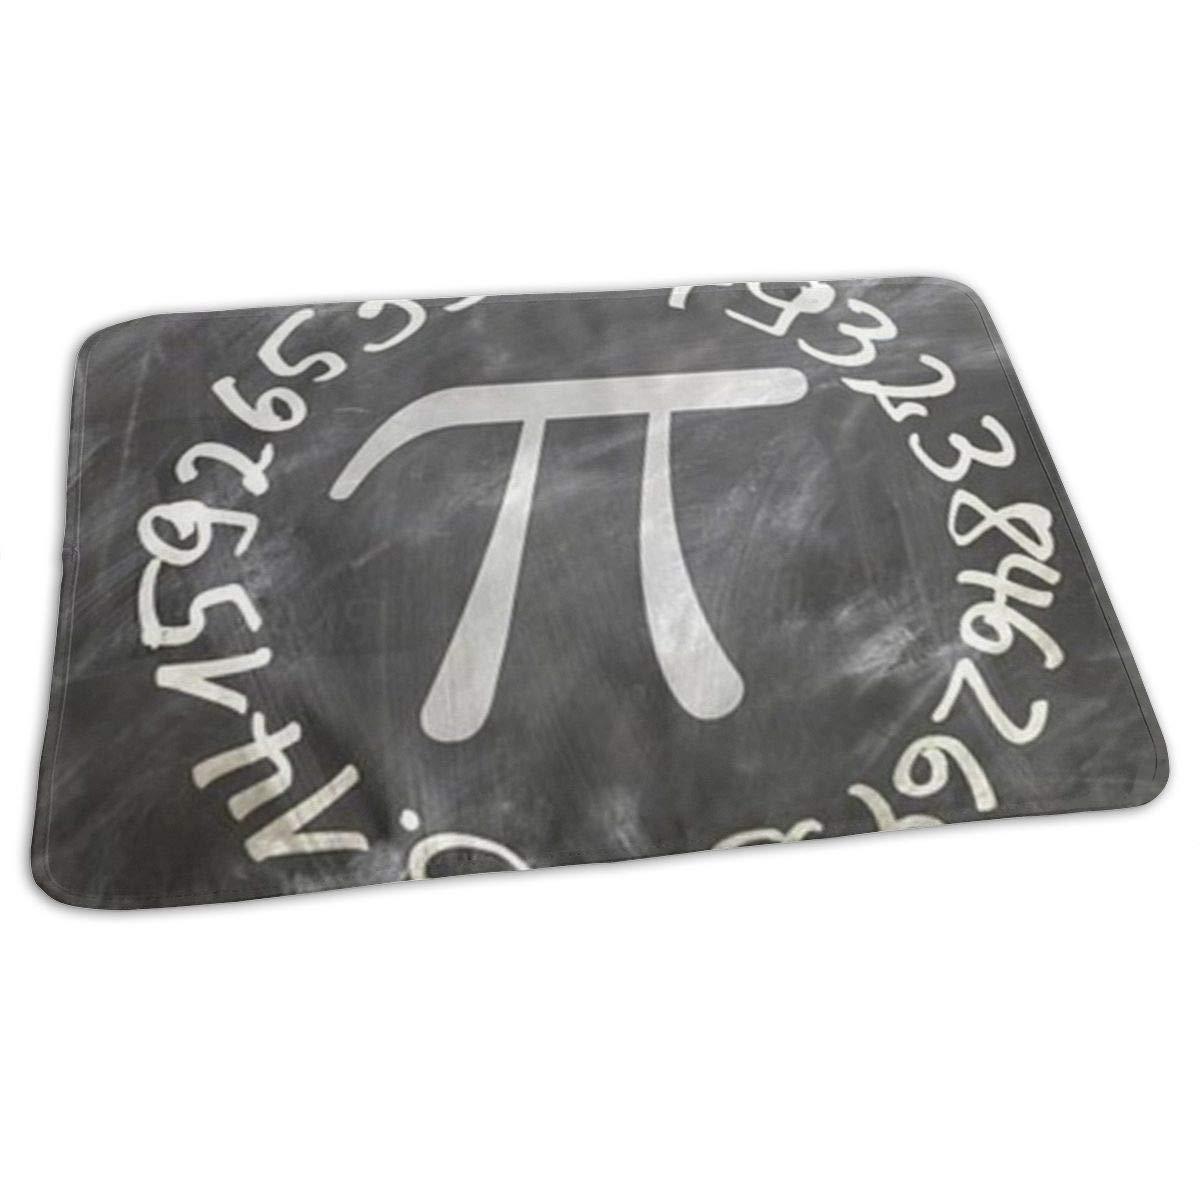 Interesting Mathematics of Pi Baby Changing Pad Waterproof Portable Changing Pad Home Travel 27.5¡±x19.7¡±